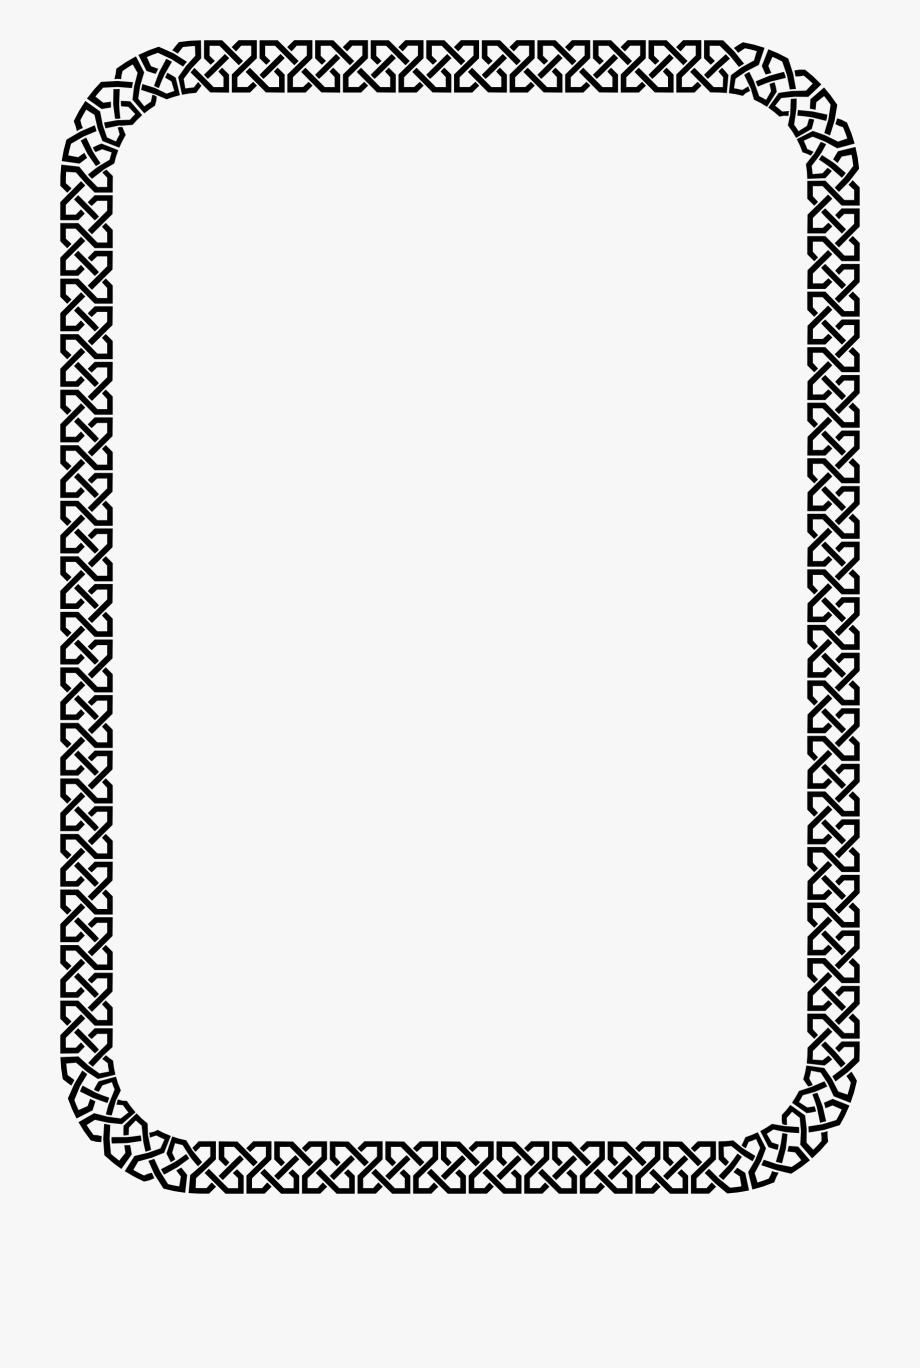 Aztec square border clipart black and white transparent Celtic Border Vector Free - Png Frame For Poster #759770 - Free ... transparent